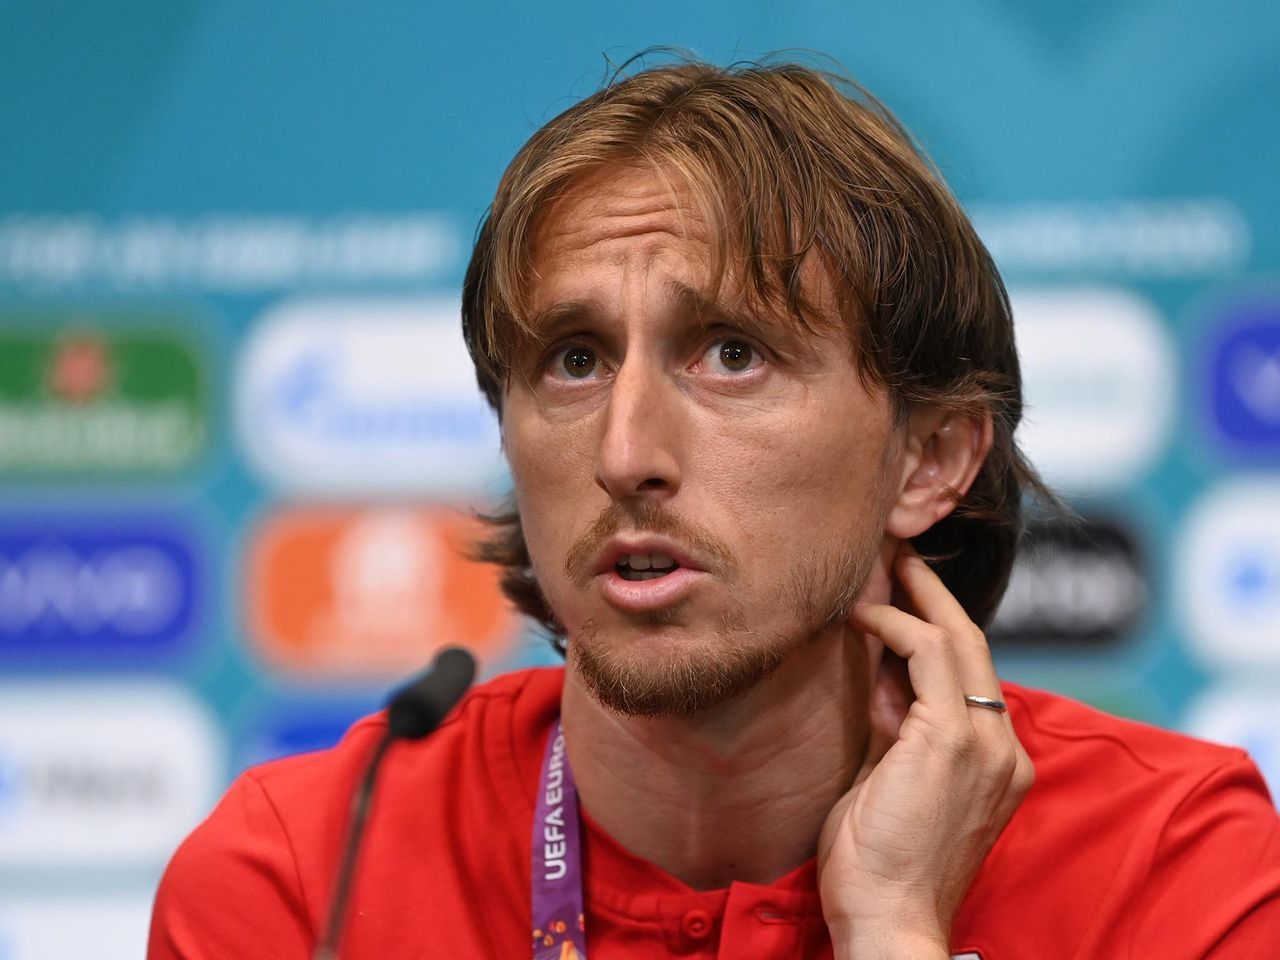 Euro 2020 news - Croatia capain Luka Modric hits out at 'arrogance' of  English media again ahead of game - Eurosport